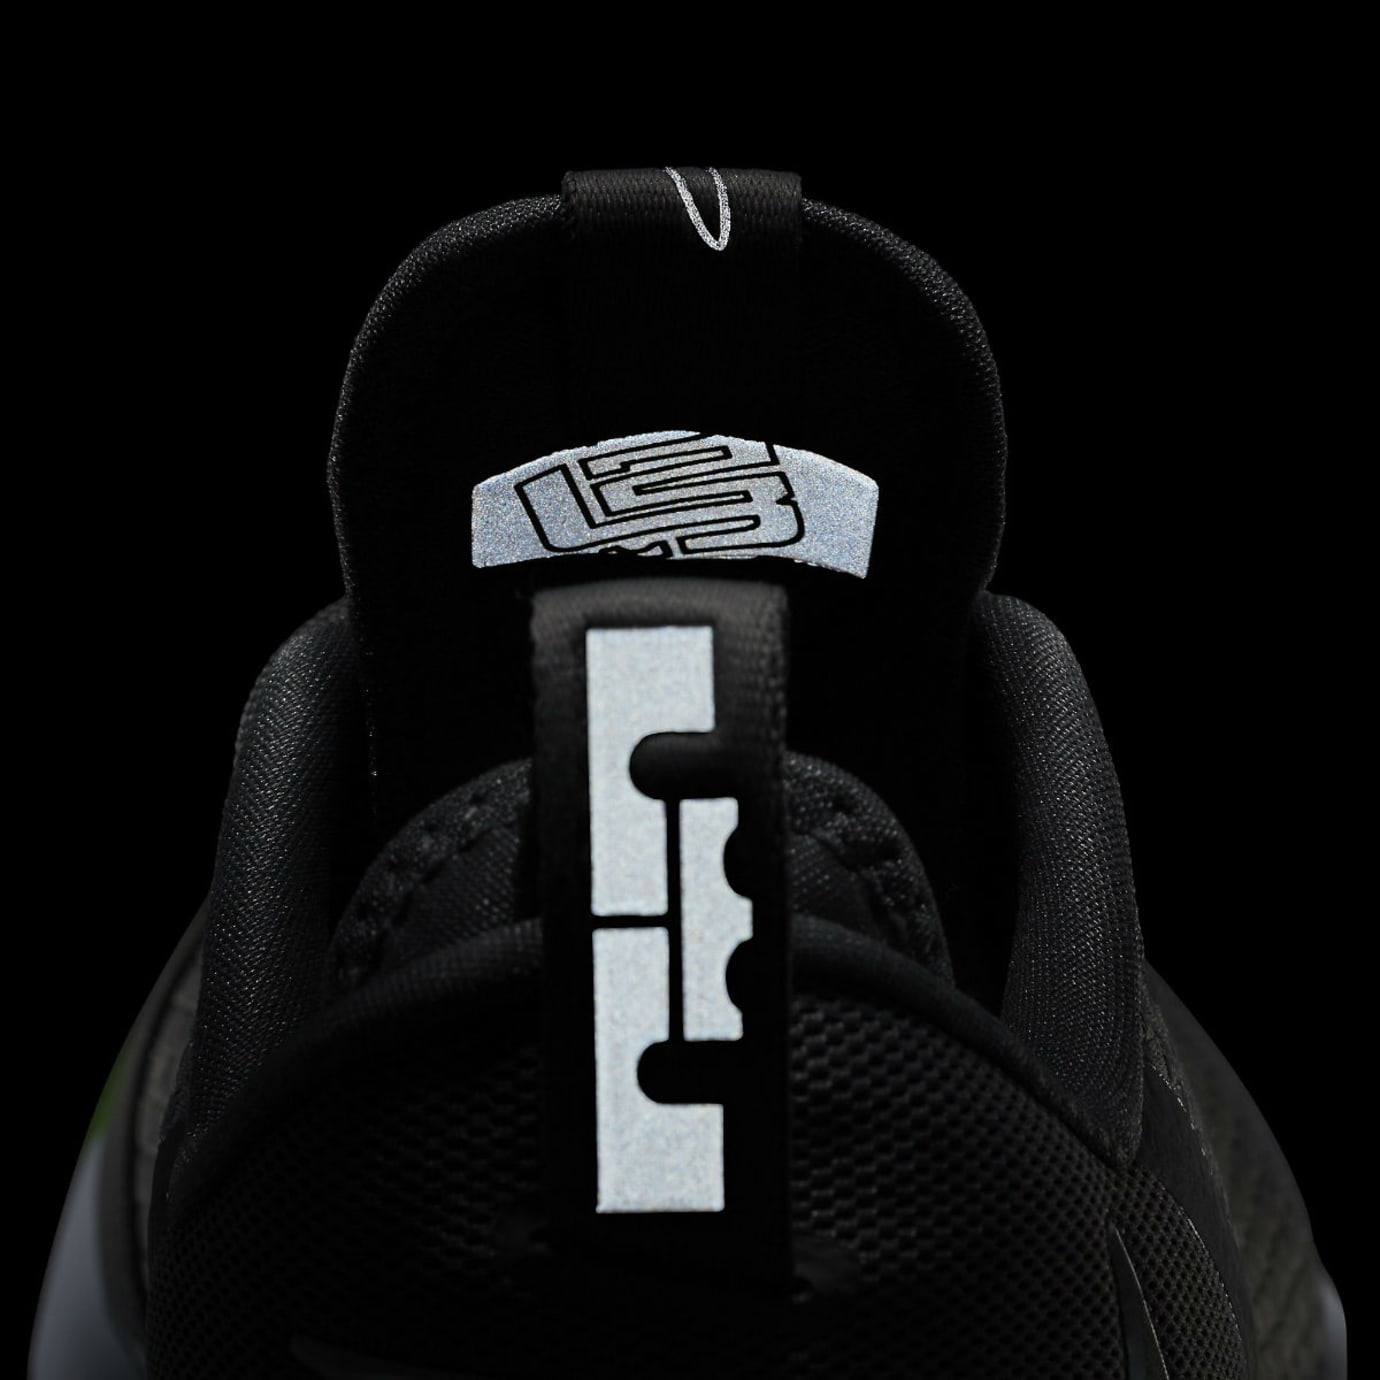 Nike LeBron 14 Low Dunkman Release Date Reflective Heel 878636-005